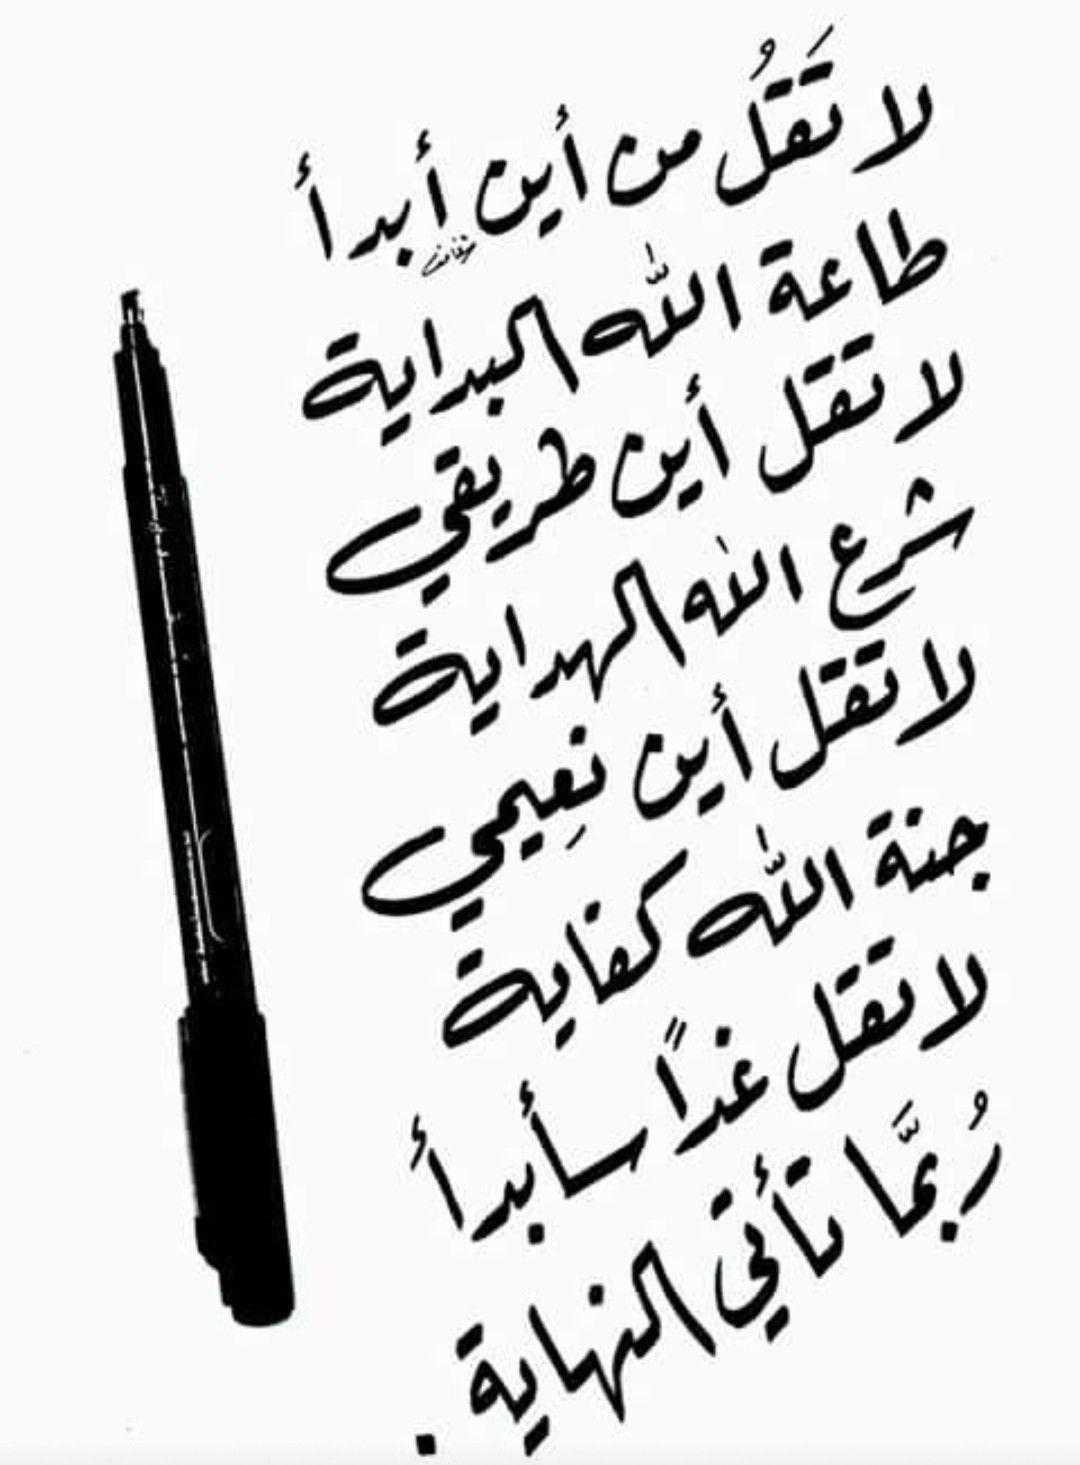 فاسجد واقترب A N S حكم مواعظ طريق بداية نهاية Arabic Quotes Funny Arabic Quotes Cool Words